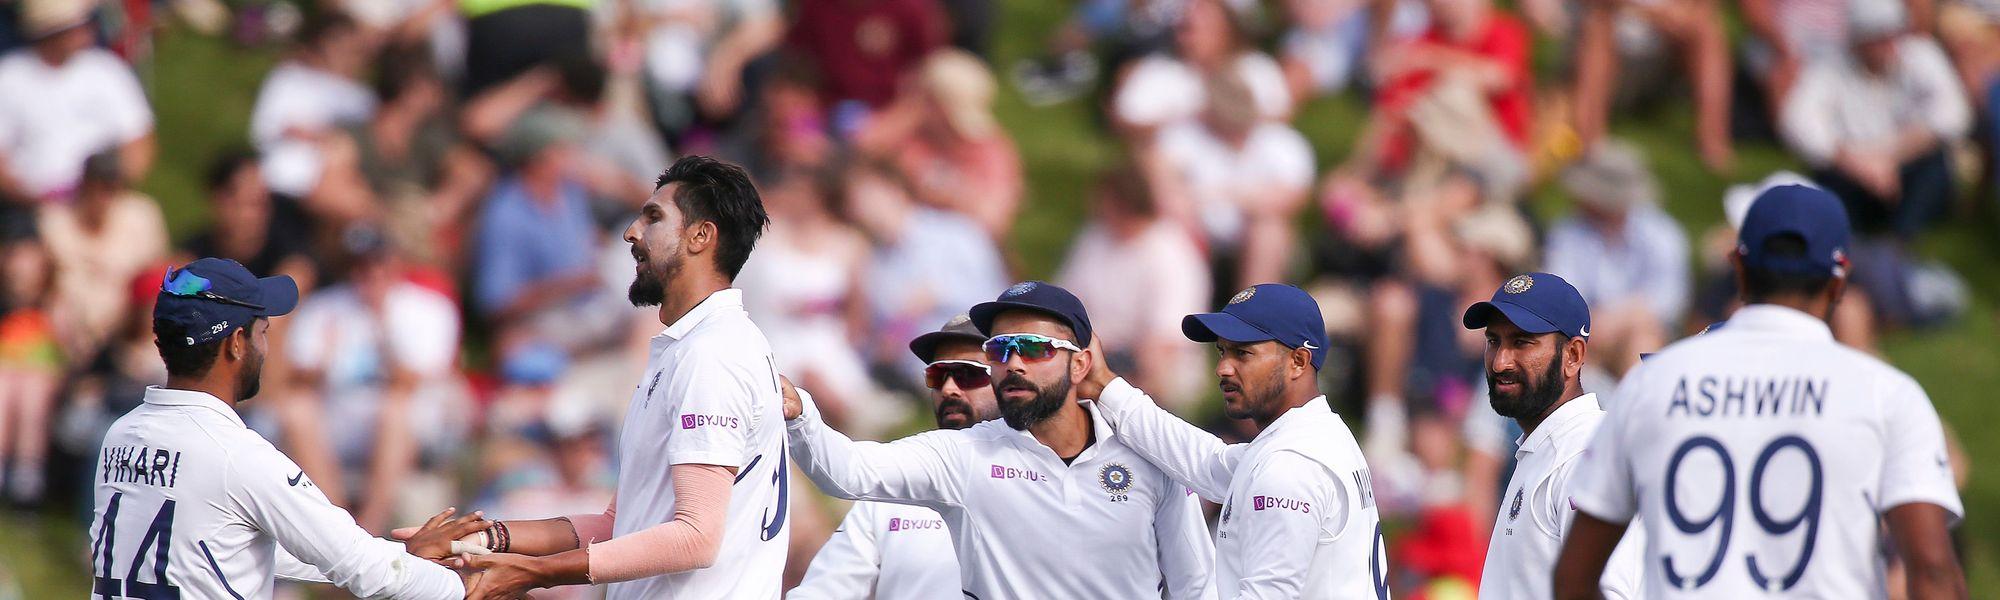 Ishant Sharma led India's fightback with a 3/31